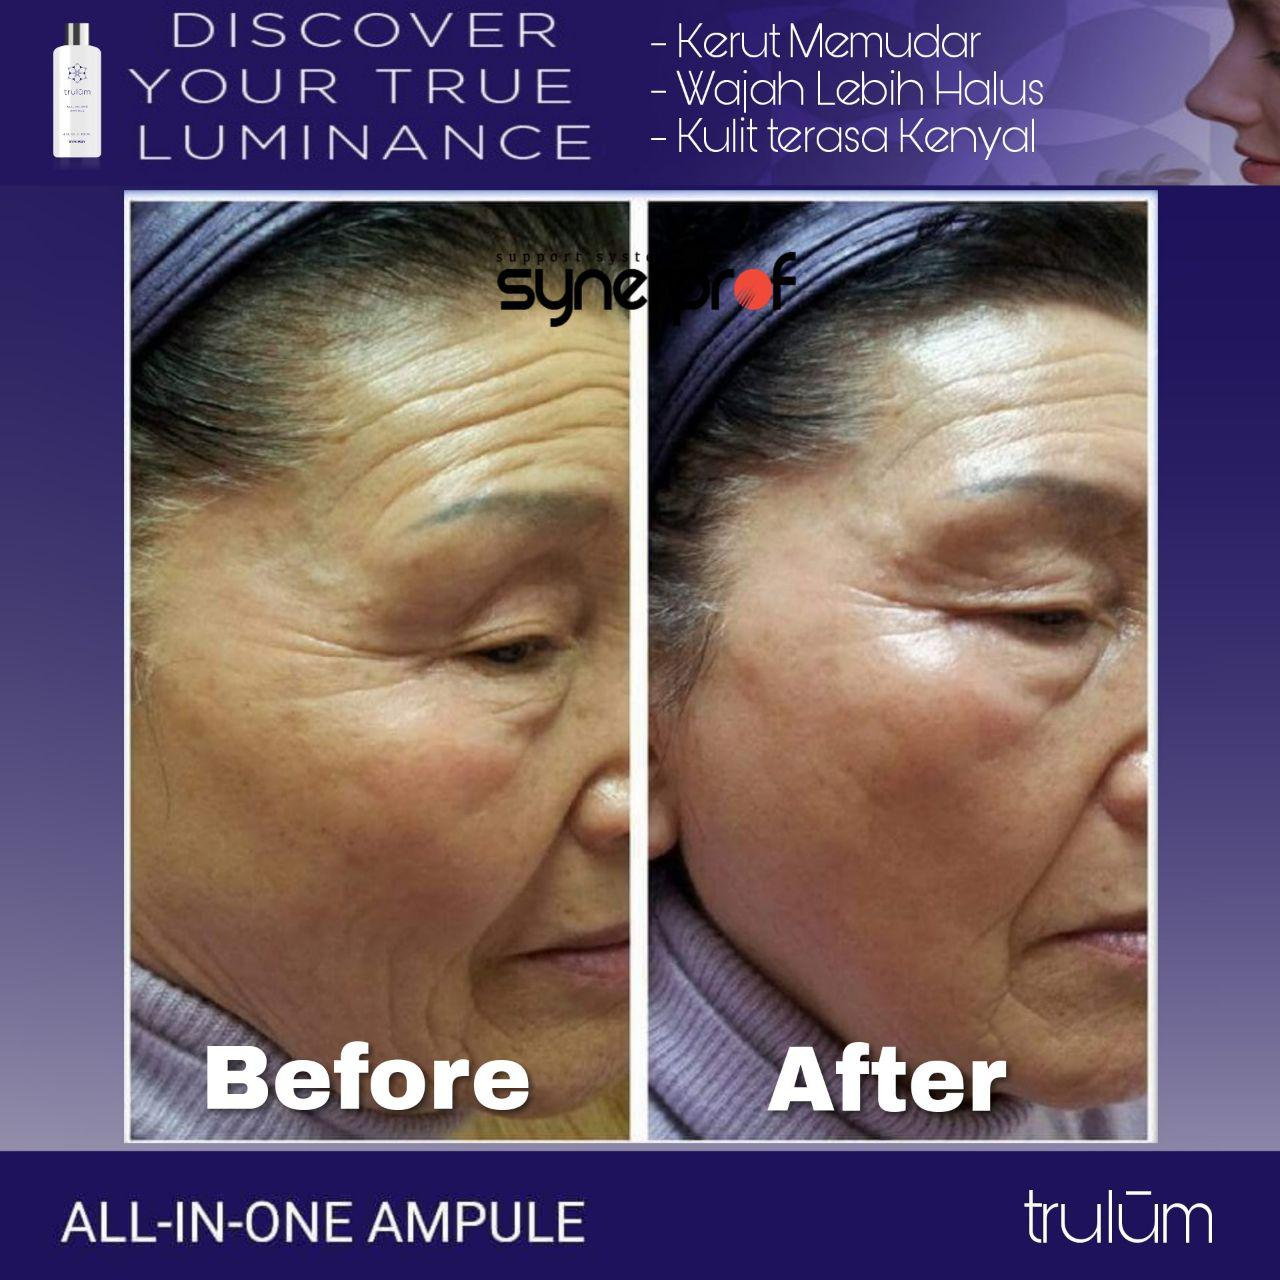 Tempat FacialKulit Sensitif di Arga Makmur, Bengkulu Utara WA: 08112338376